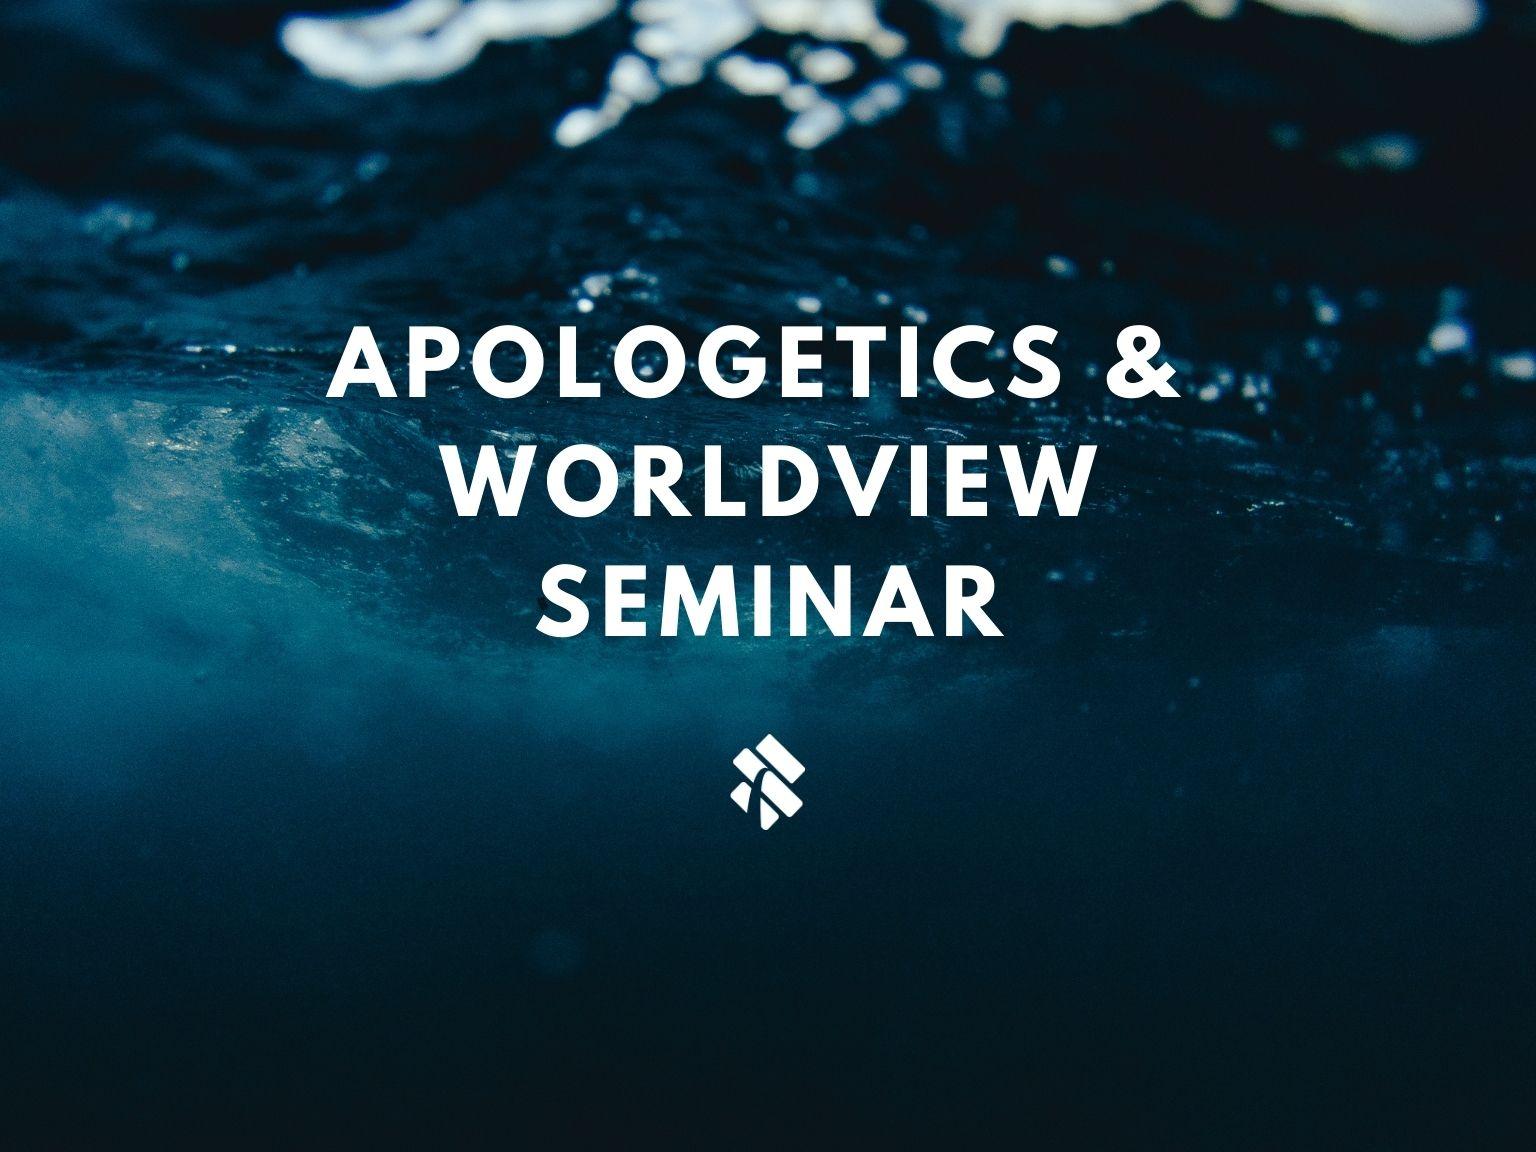 Apologetics Seminar